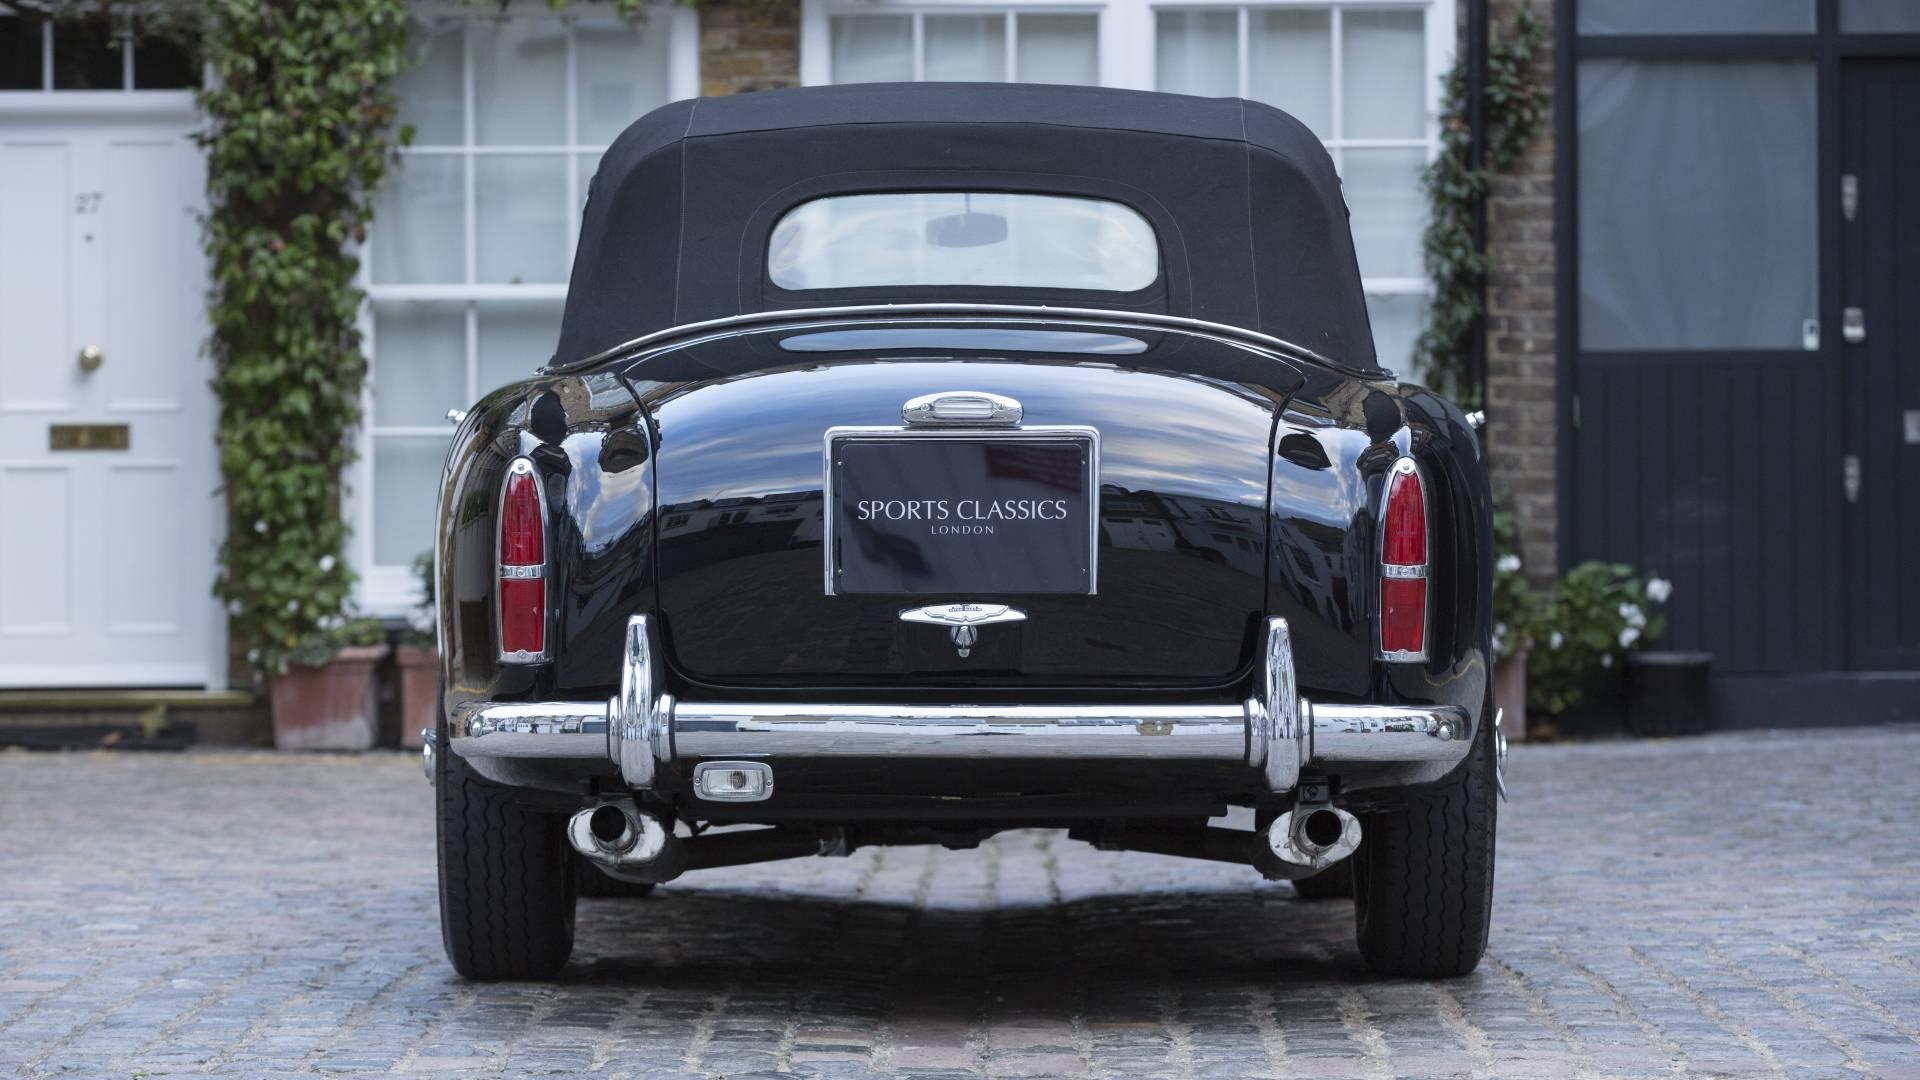 Aston Martin DB 2/4 Mk III (1959) for Sale - Classic Trader